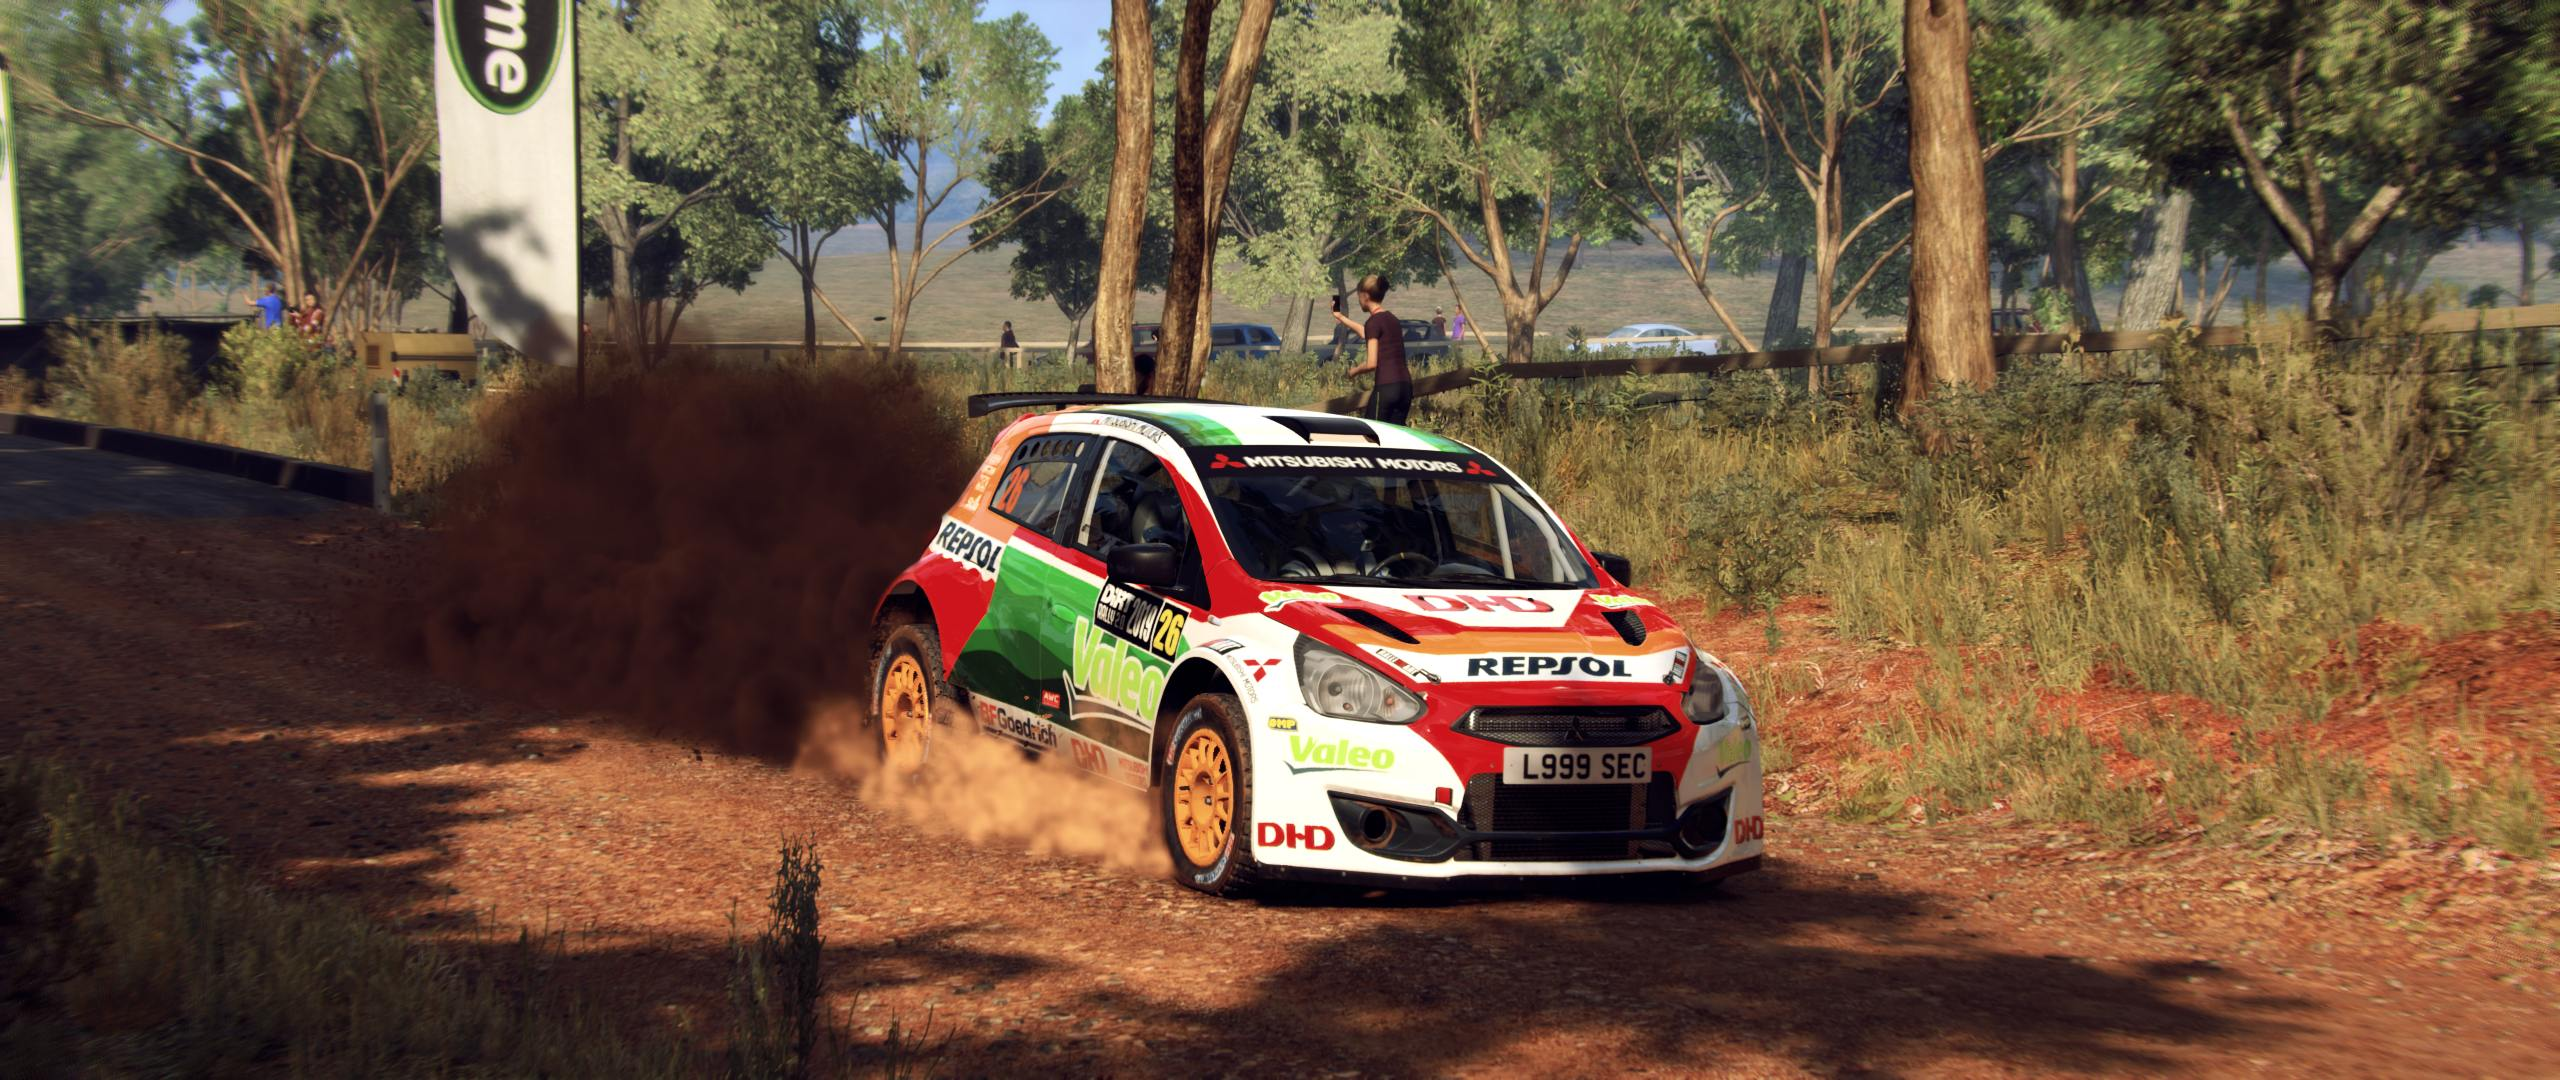 Dirt Rally 2 Screenshot 2021.04.30 - 11.01.37.19.jpg